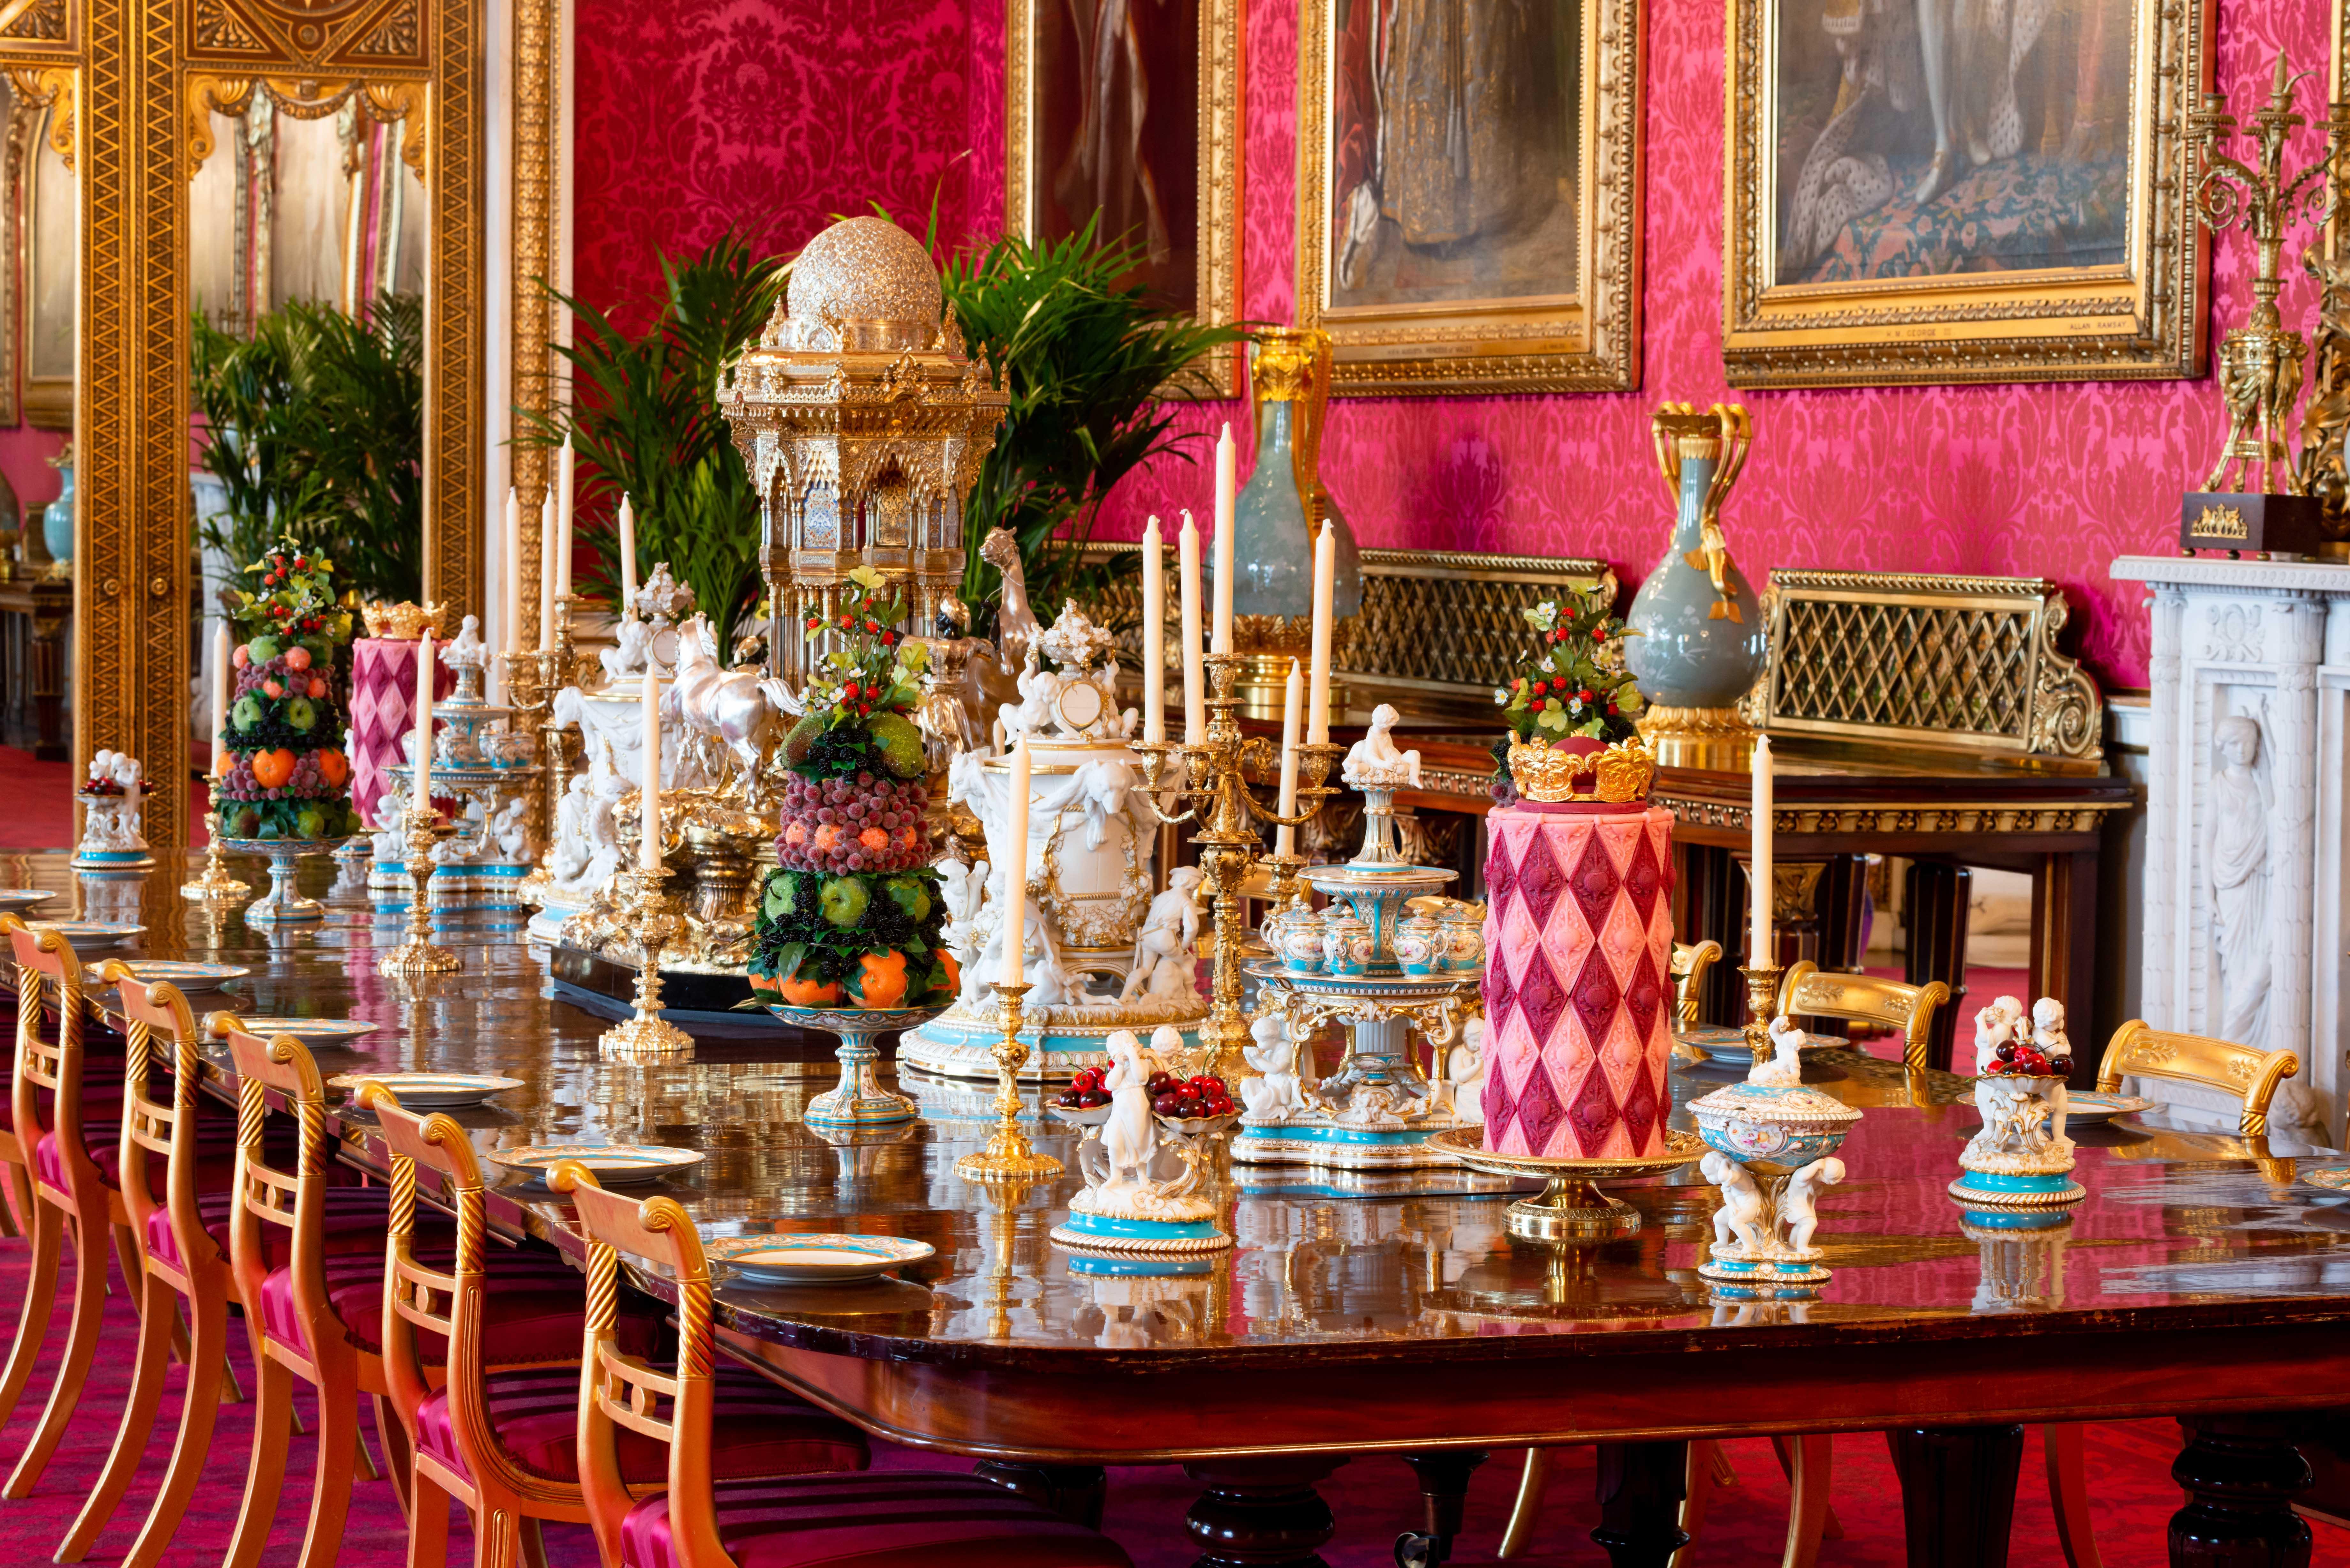 RC BPSO 2019. Queen Victoria's Palace Exhibiton.